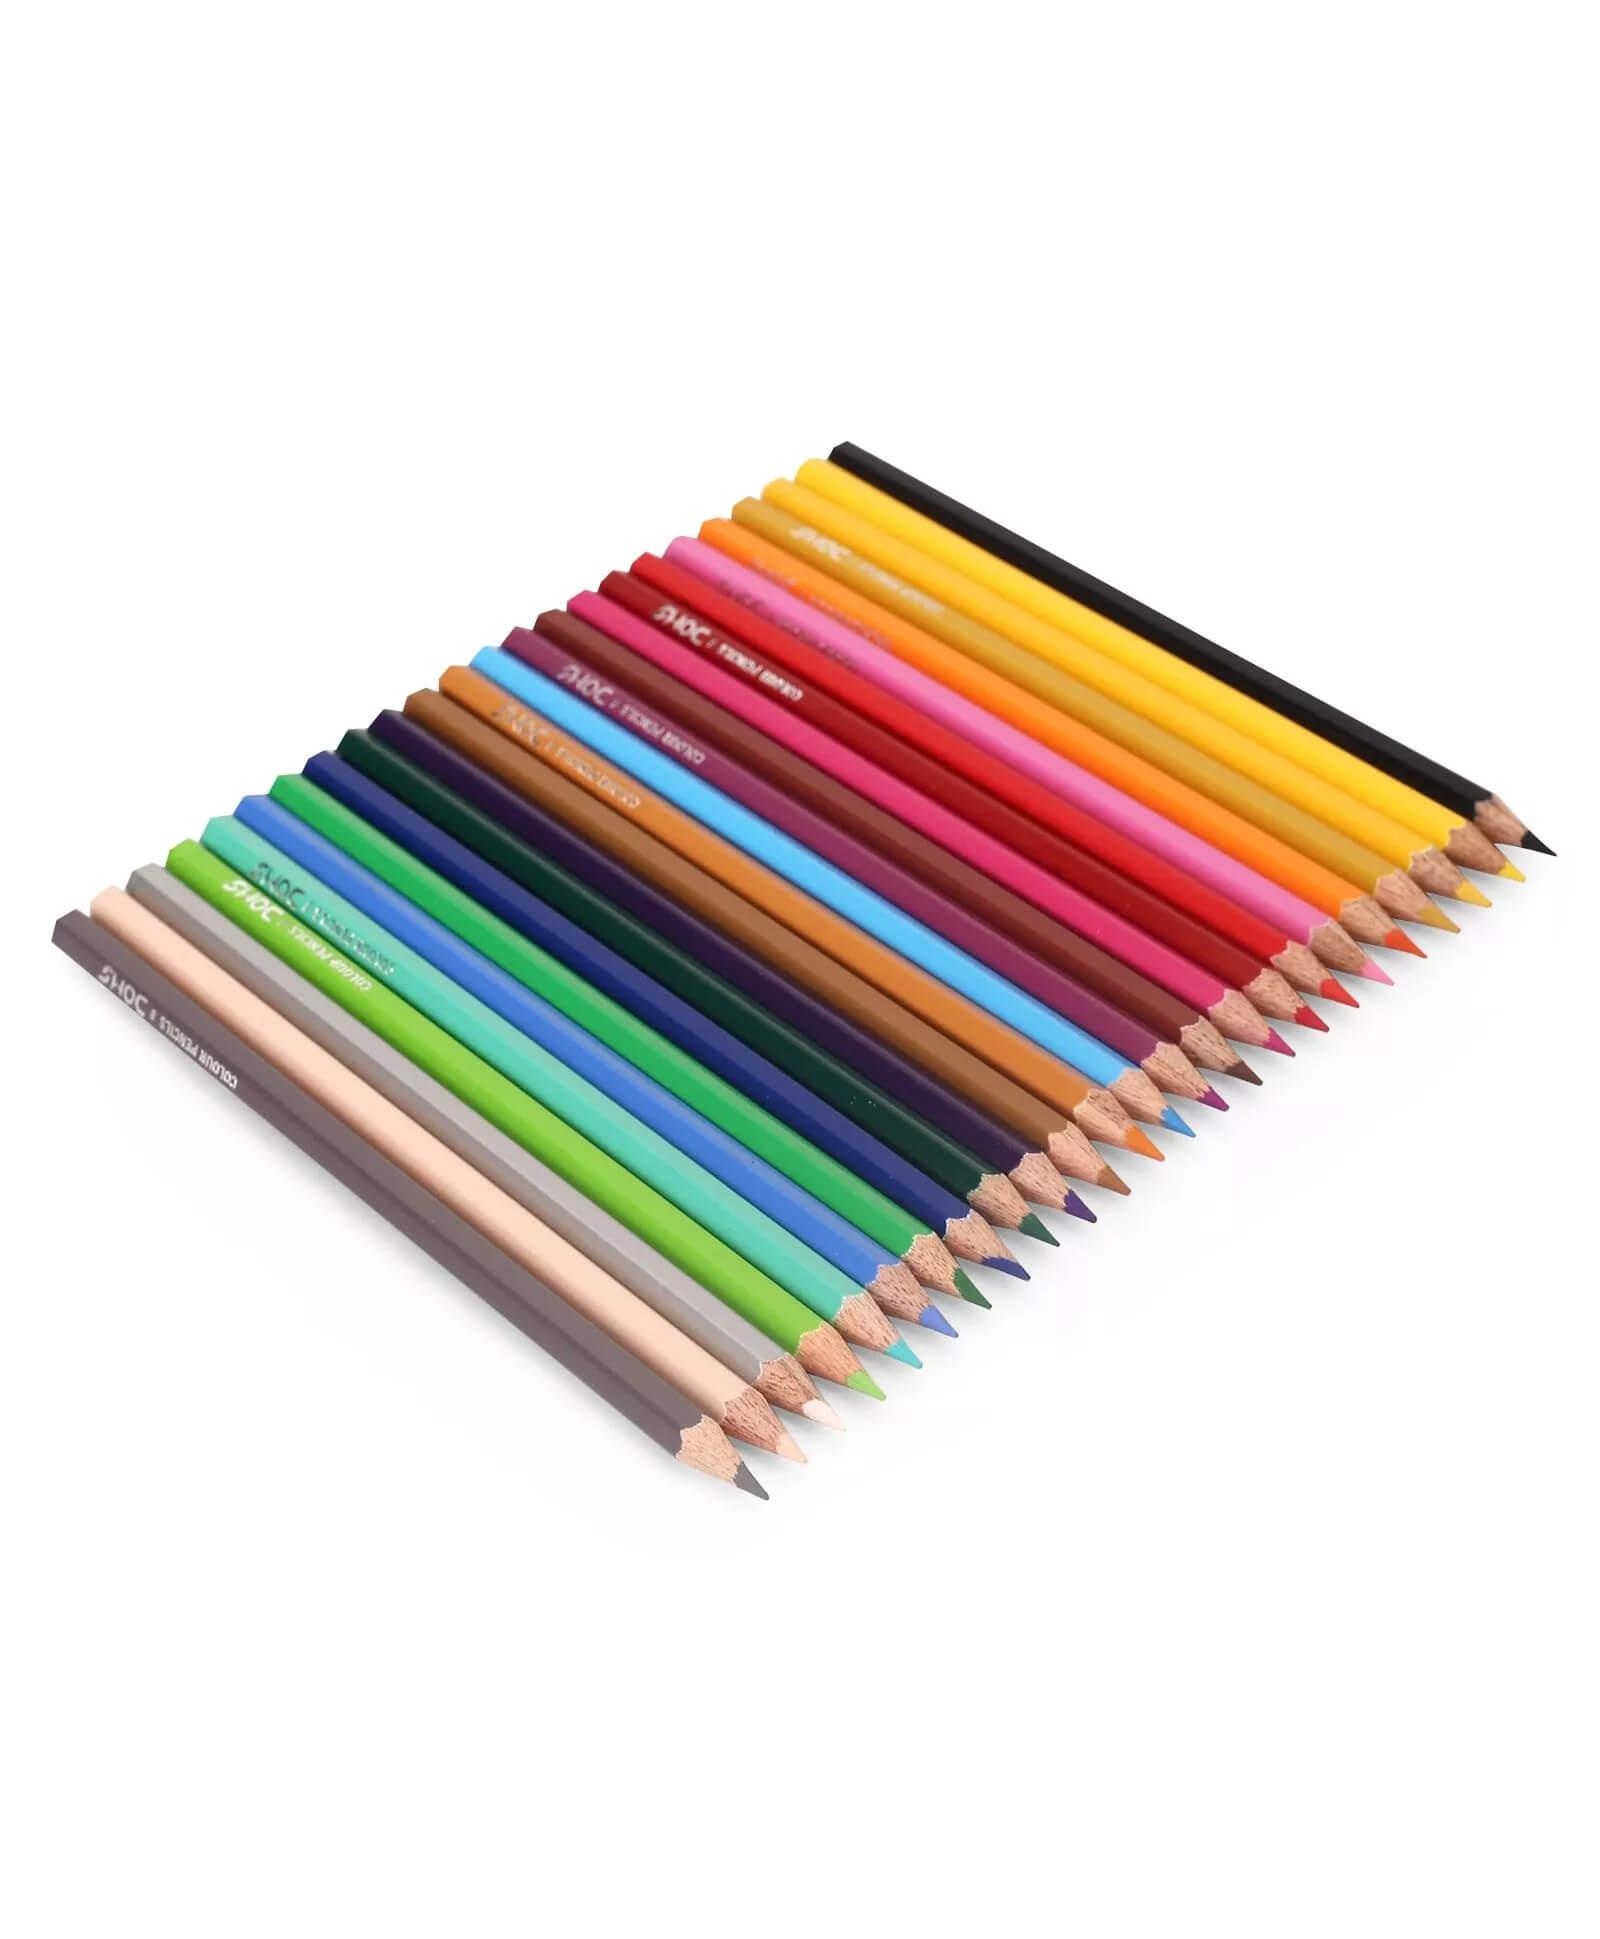 DOMS 24 Shades Color Pencils